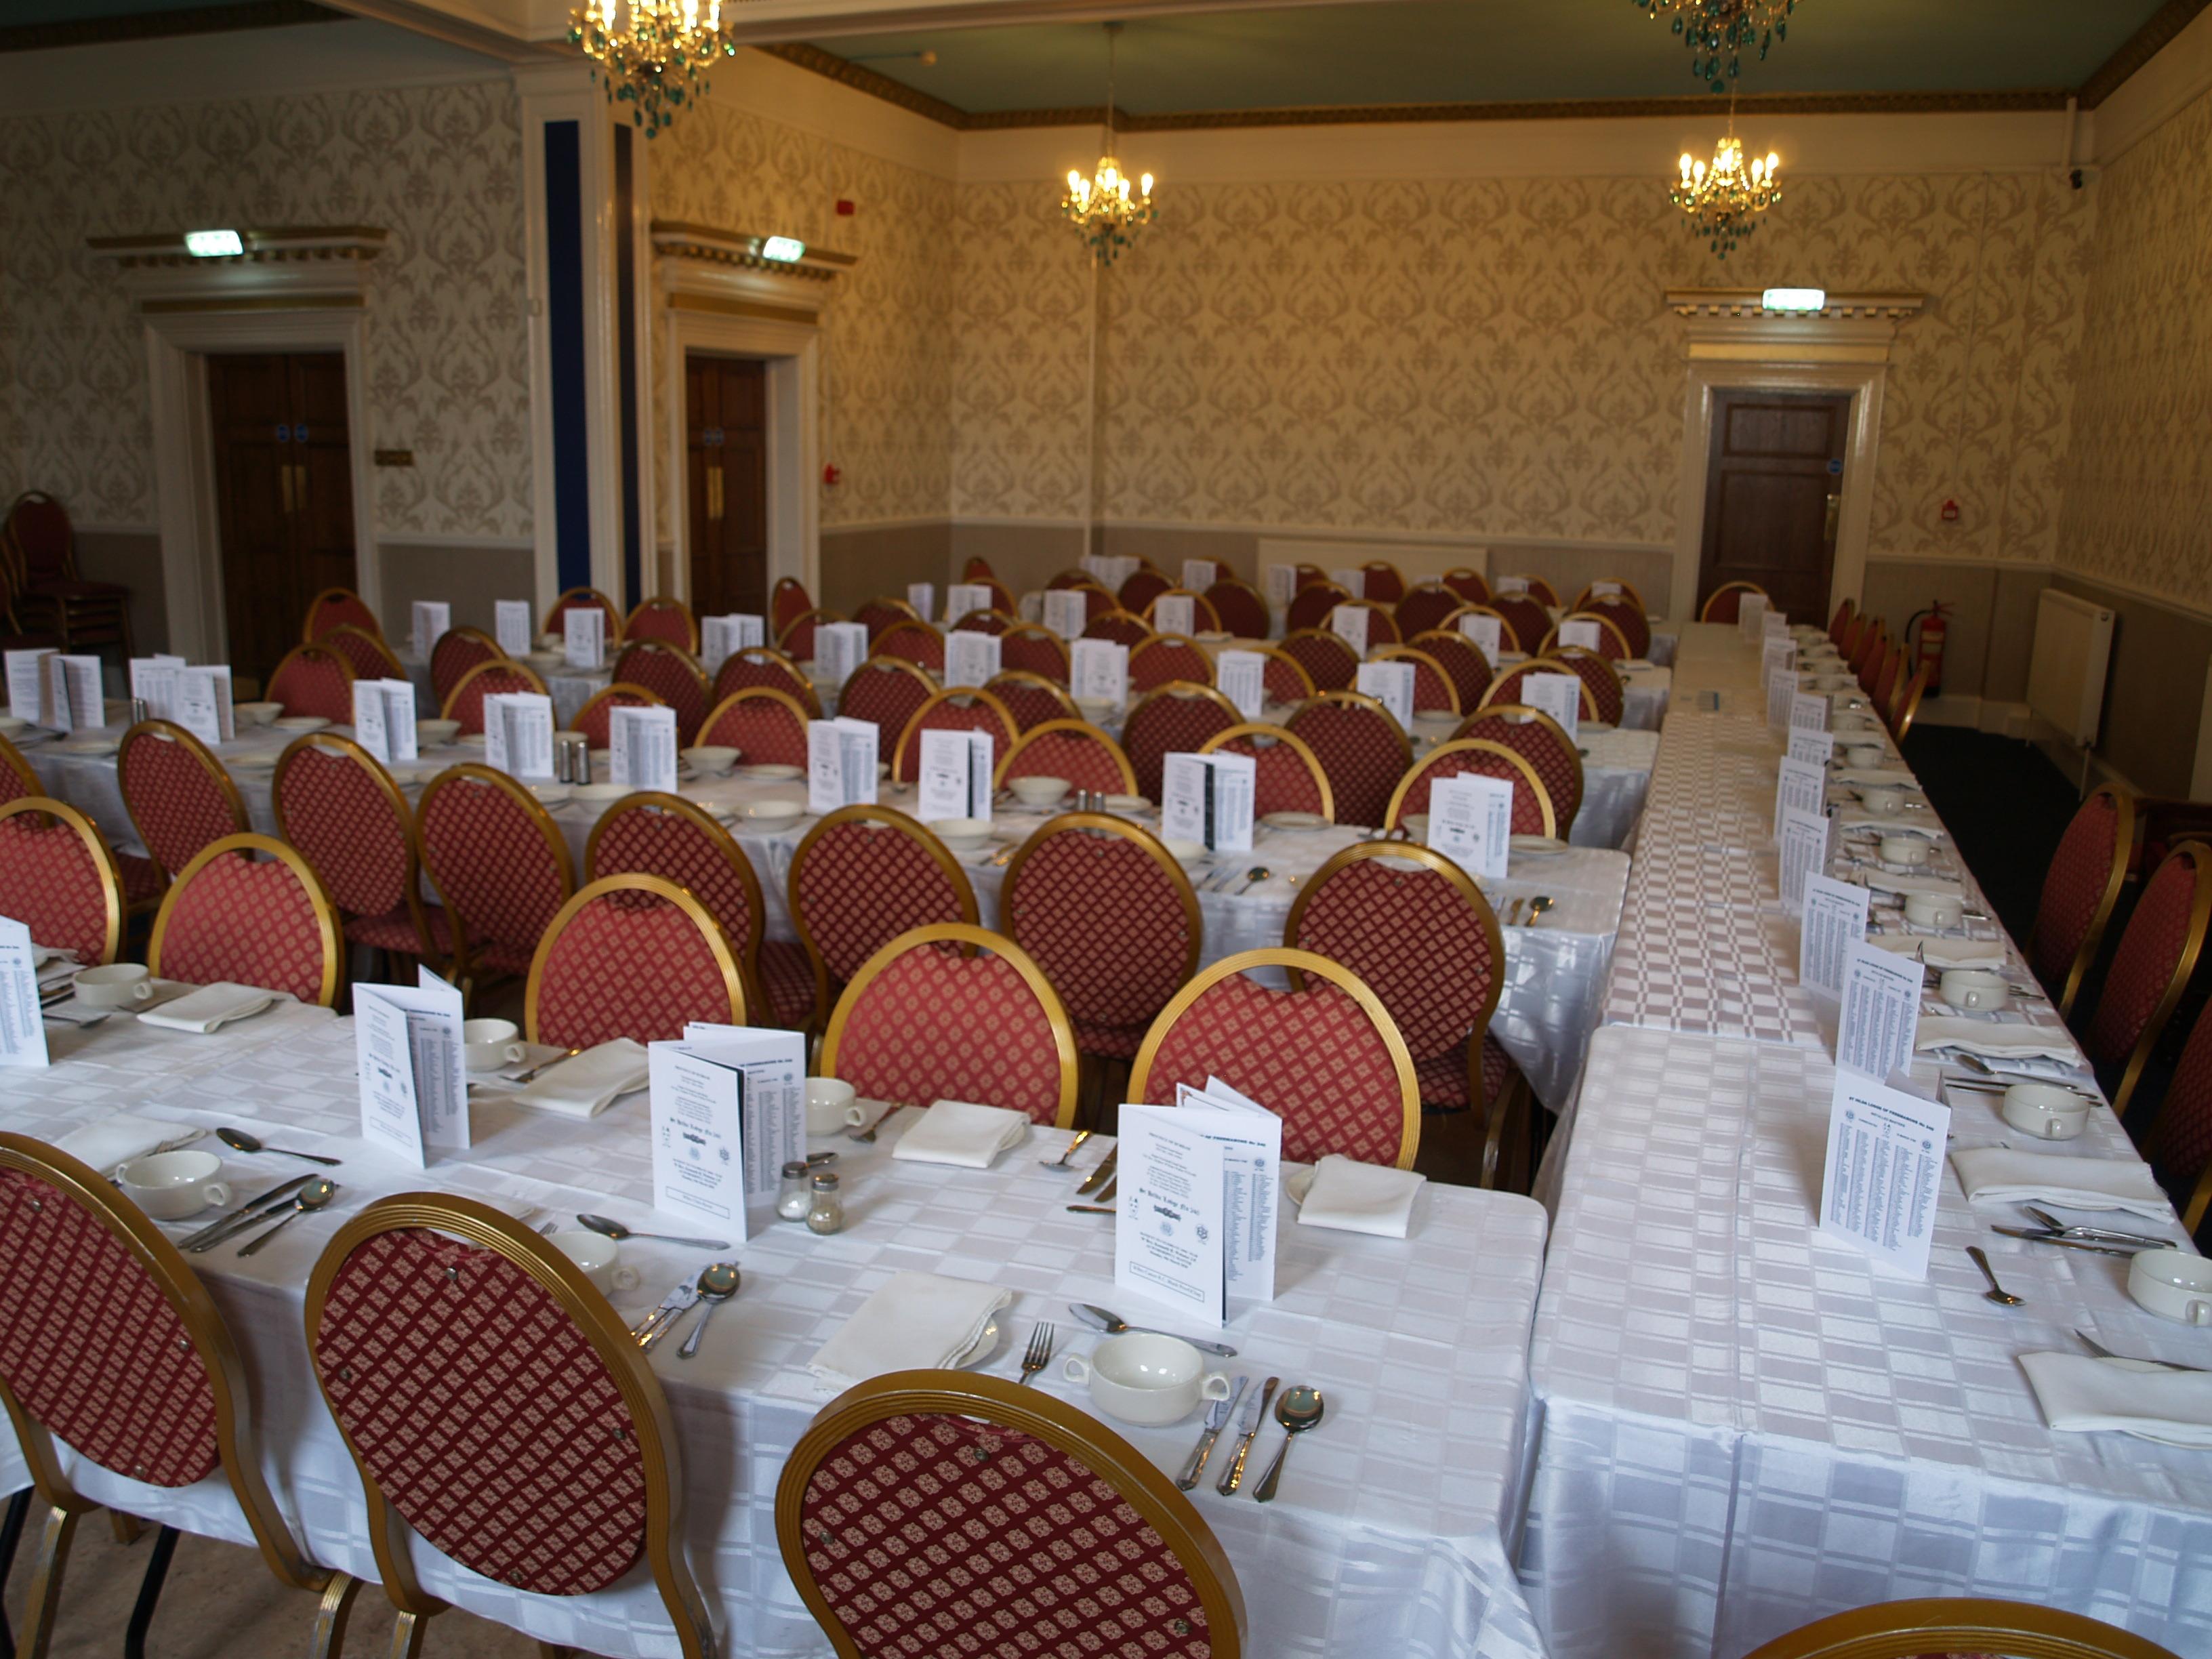 South Shields Masonic Hall 4